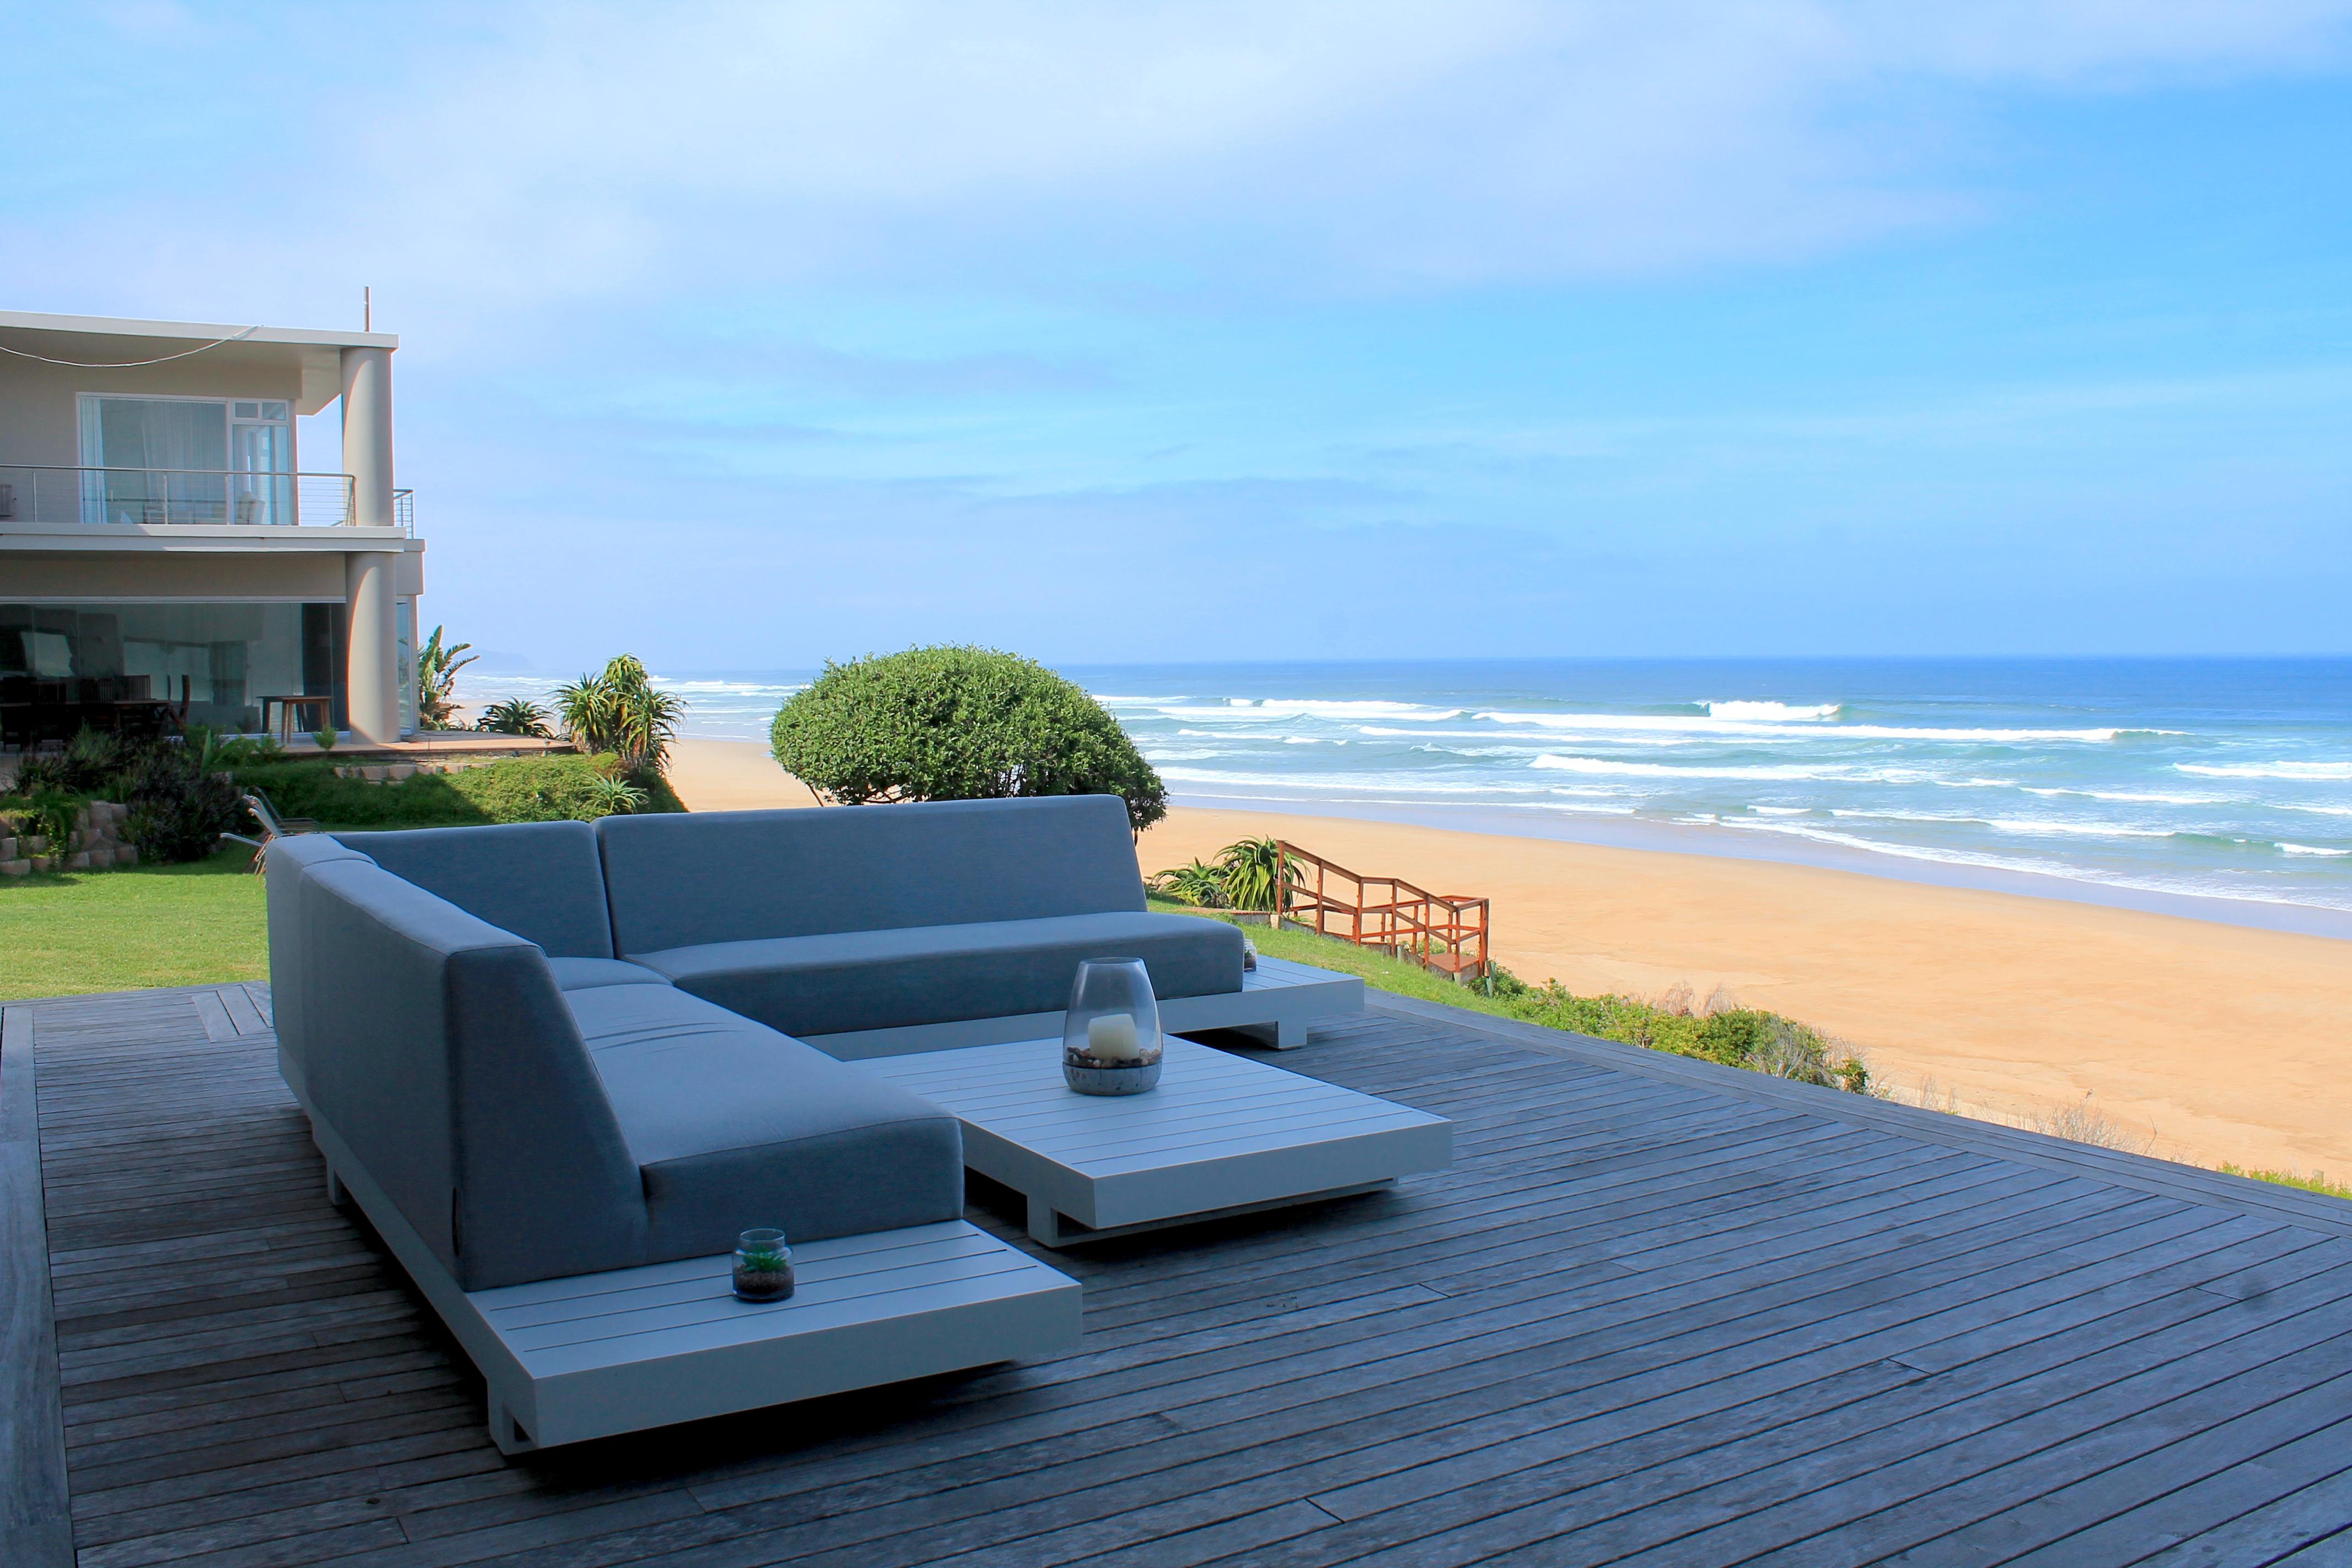 terrace-gardenroute-seaview-lustforthesublime